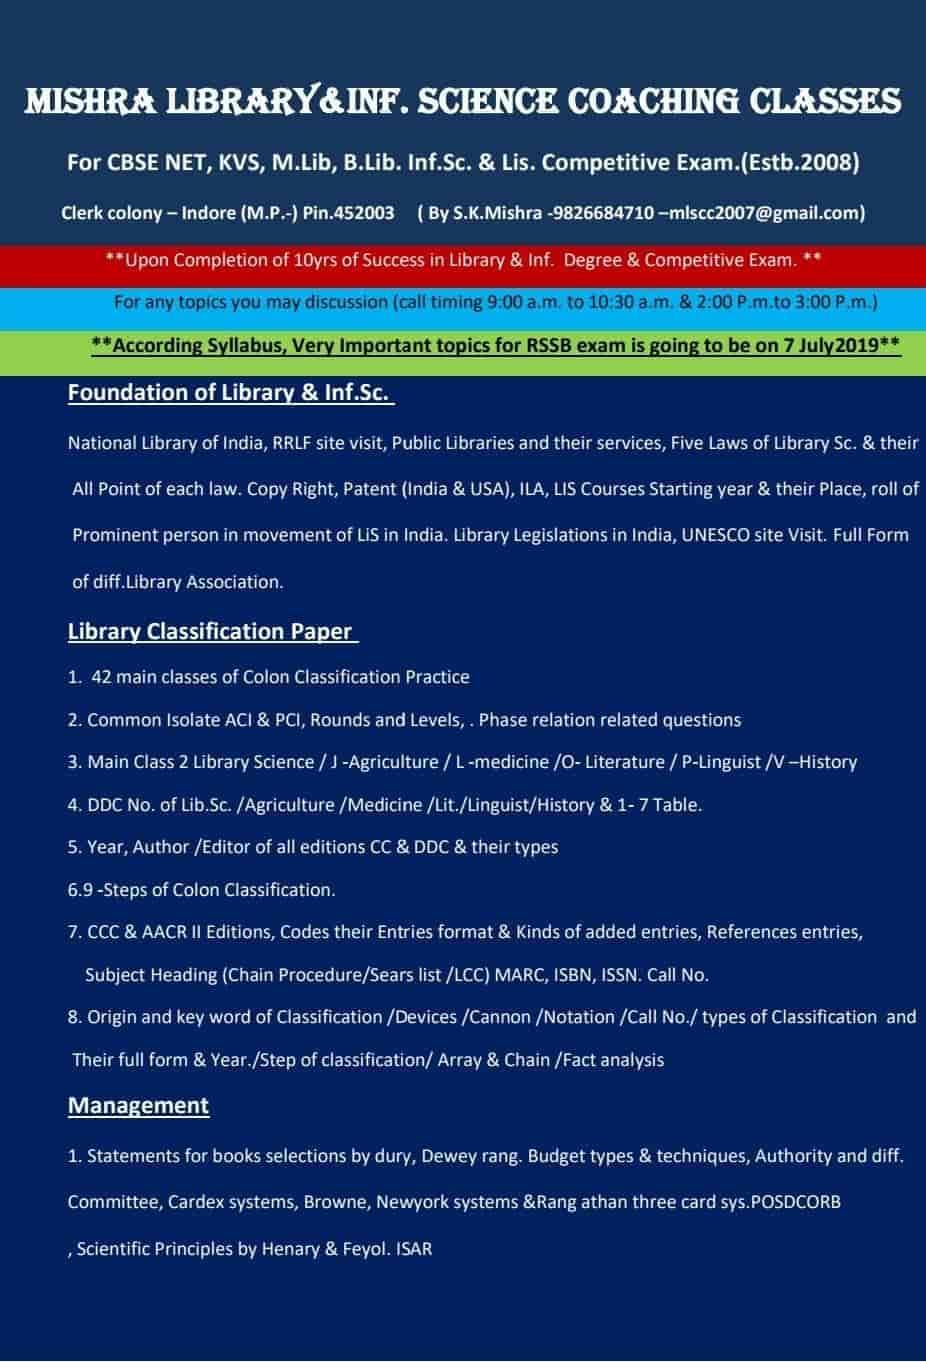 Mishra Library Science Coaching Classes, Pardesipura - UGC